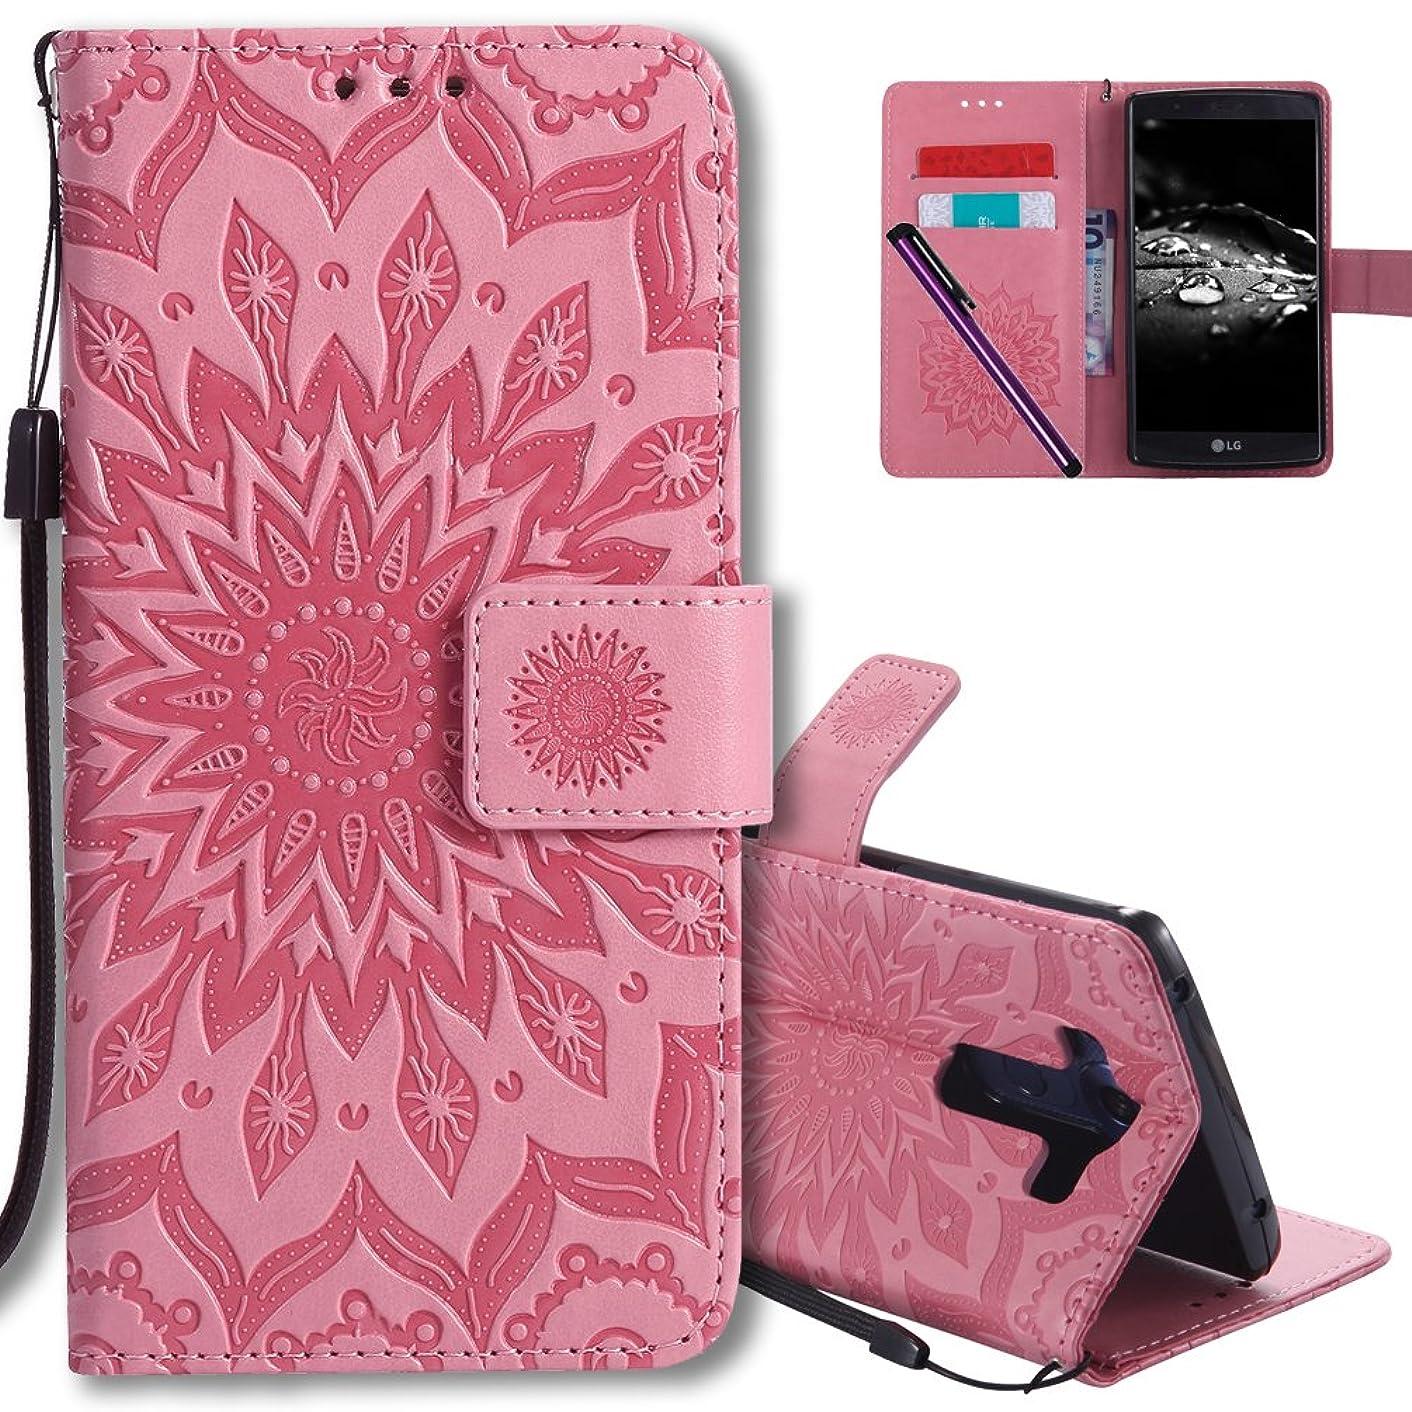 LG V10 Flip Case COTDINFORCA Emboss Mandala with Card Holder Slot Pockets, Wrist Strap, Magnetic Closure Premium PU Leather Case Cover For LG V10 (2015). Mandala Pink